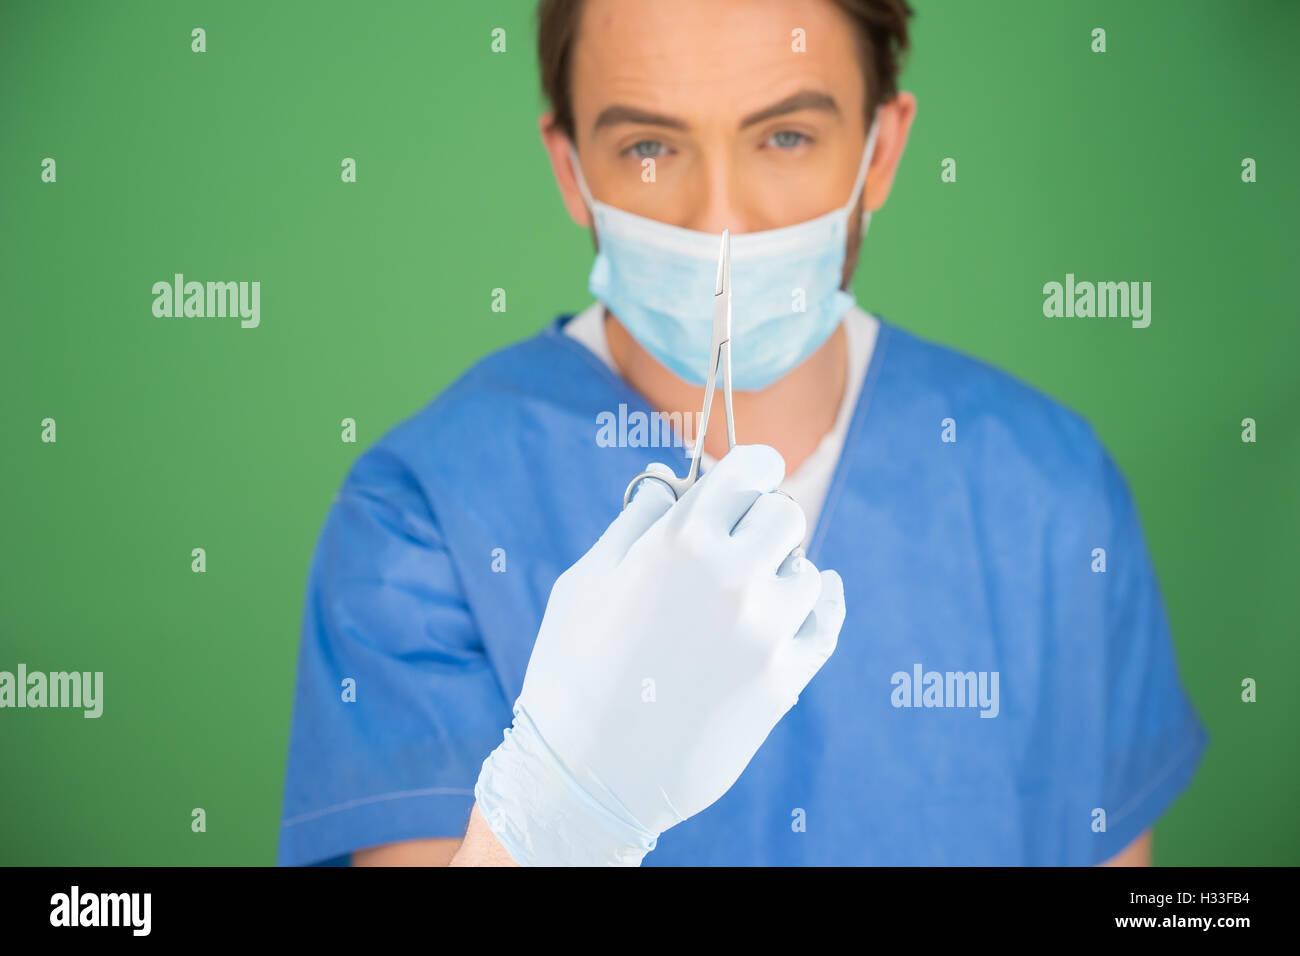 Enfermero o médico con un par de pinzas Foto de stock